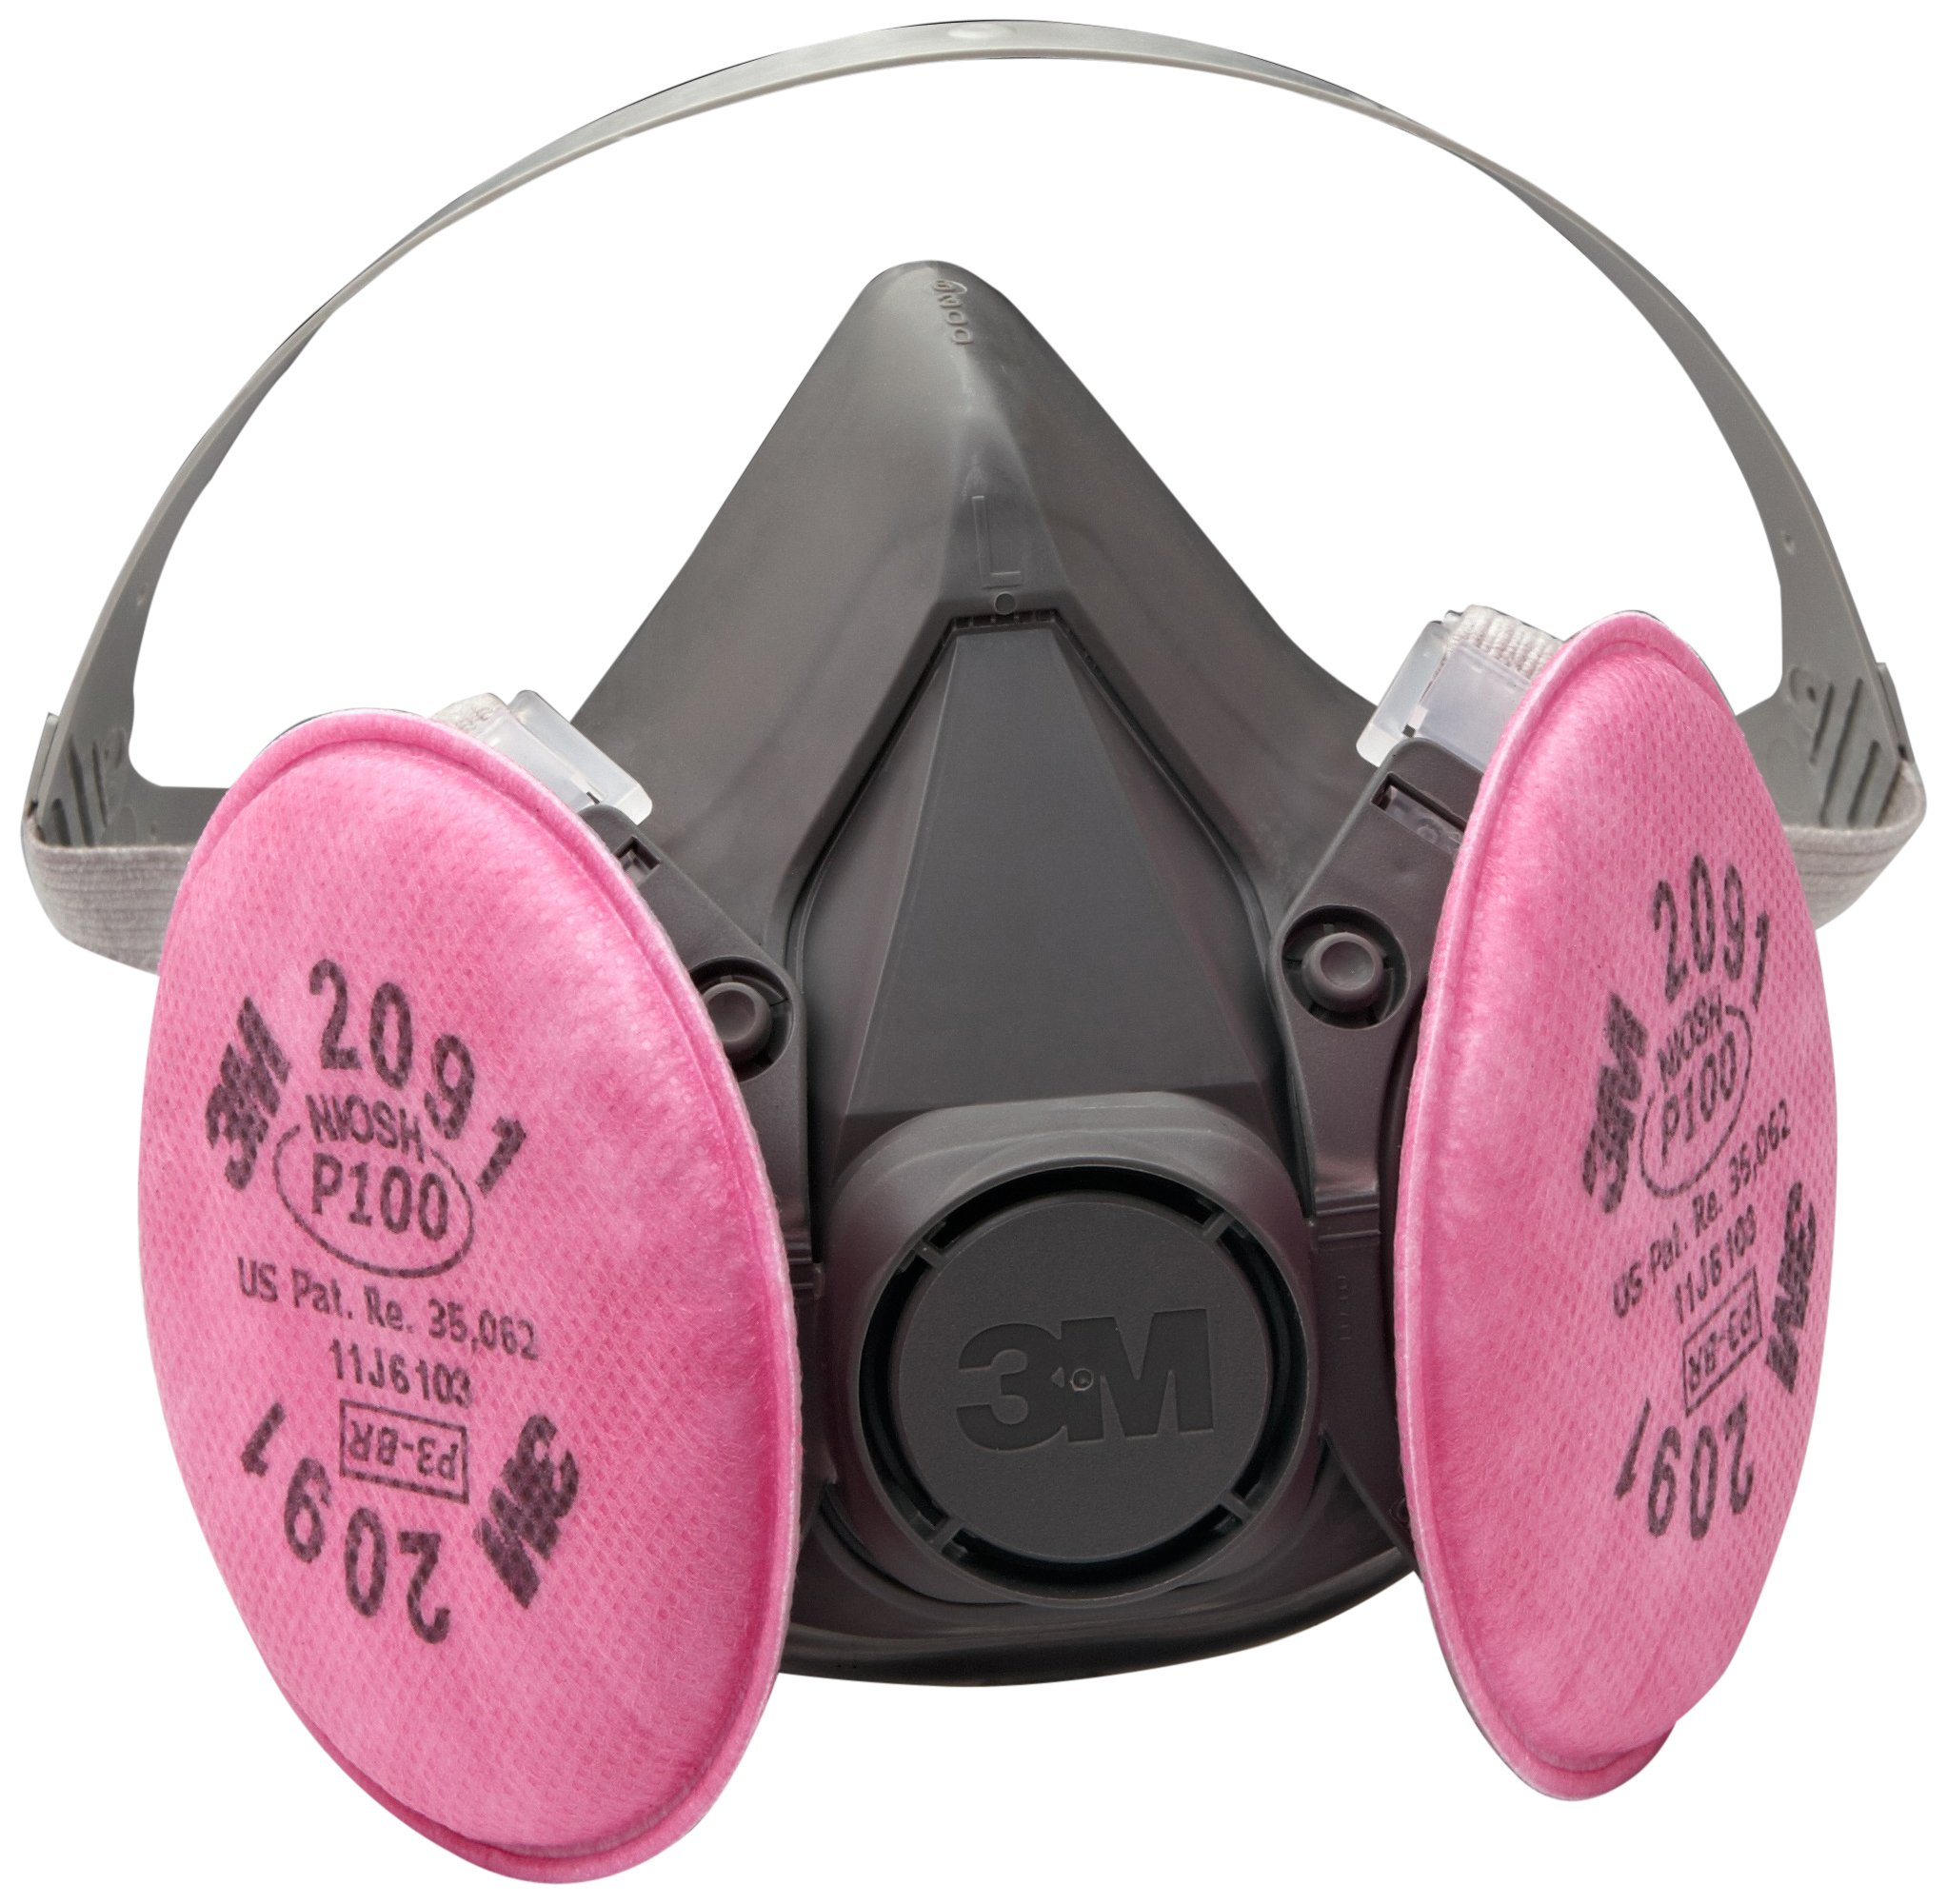 3M Half Facepiece Reusable Respirator Assembly 6391/07003(AAD), P100 Respiratory Protection, Large